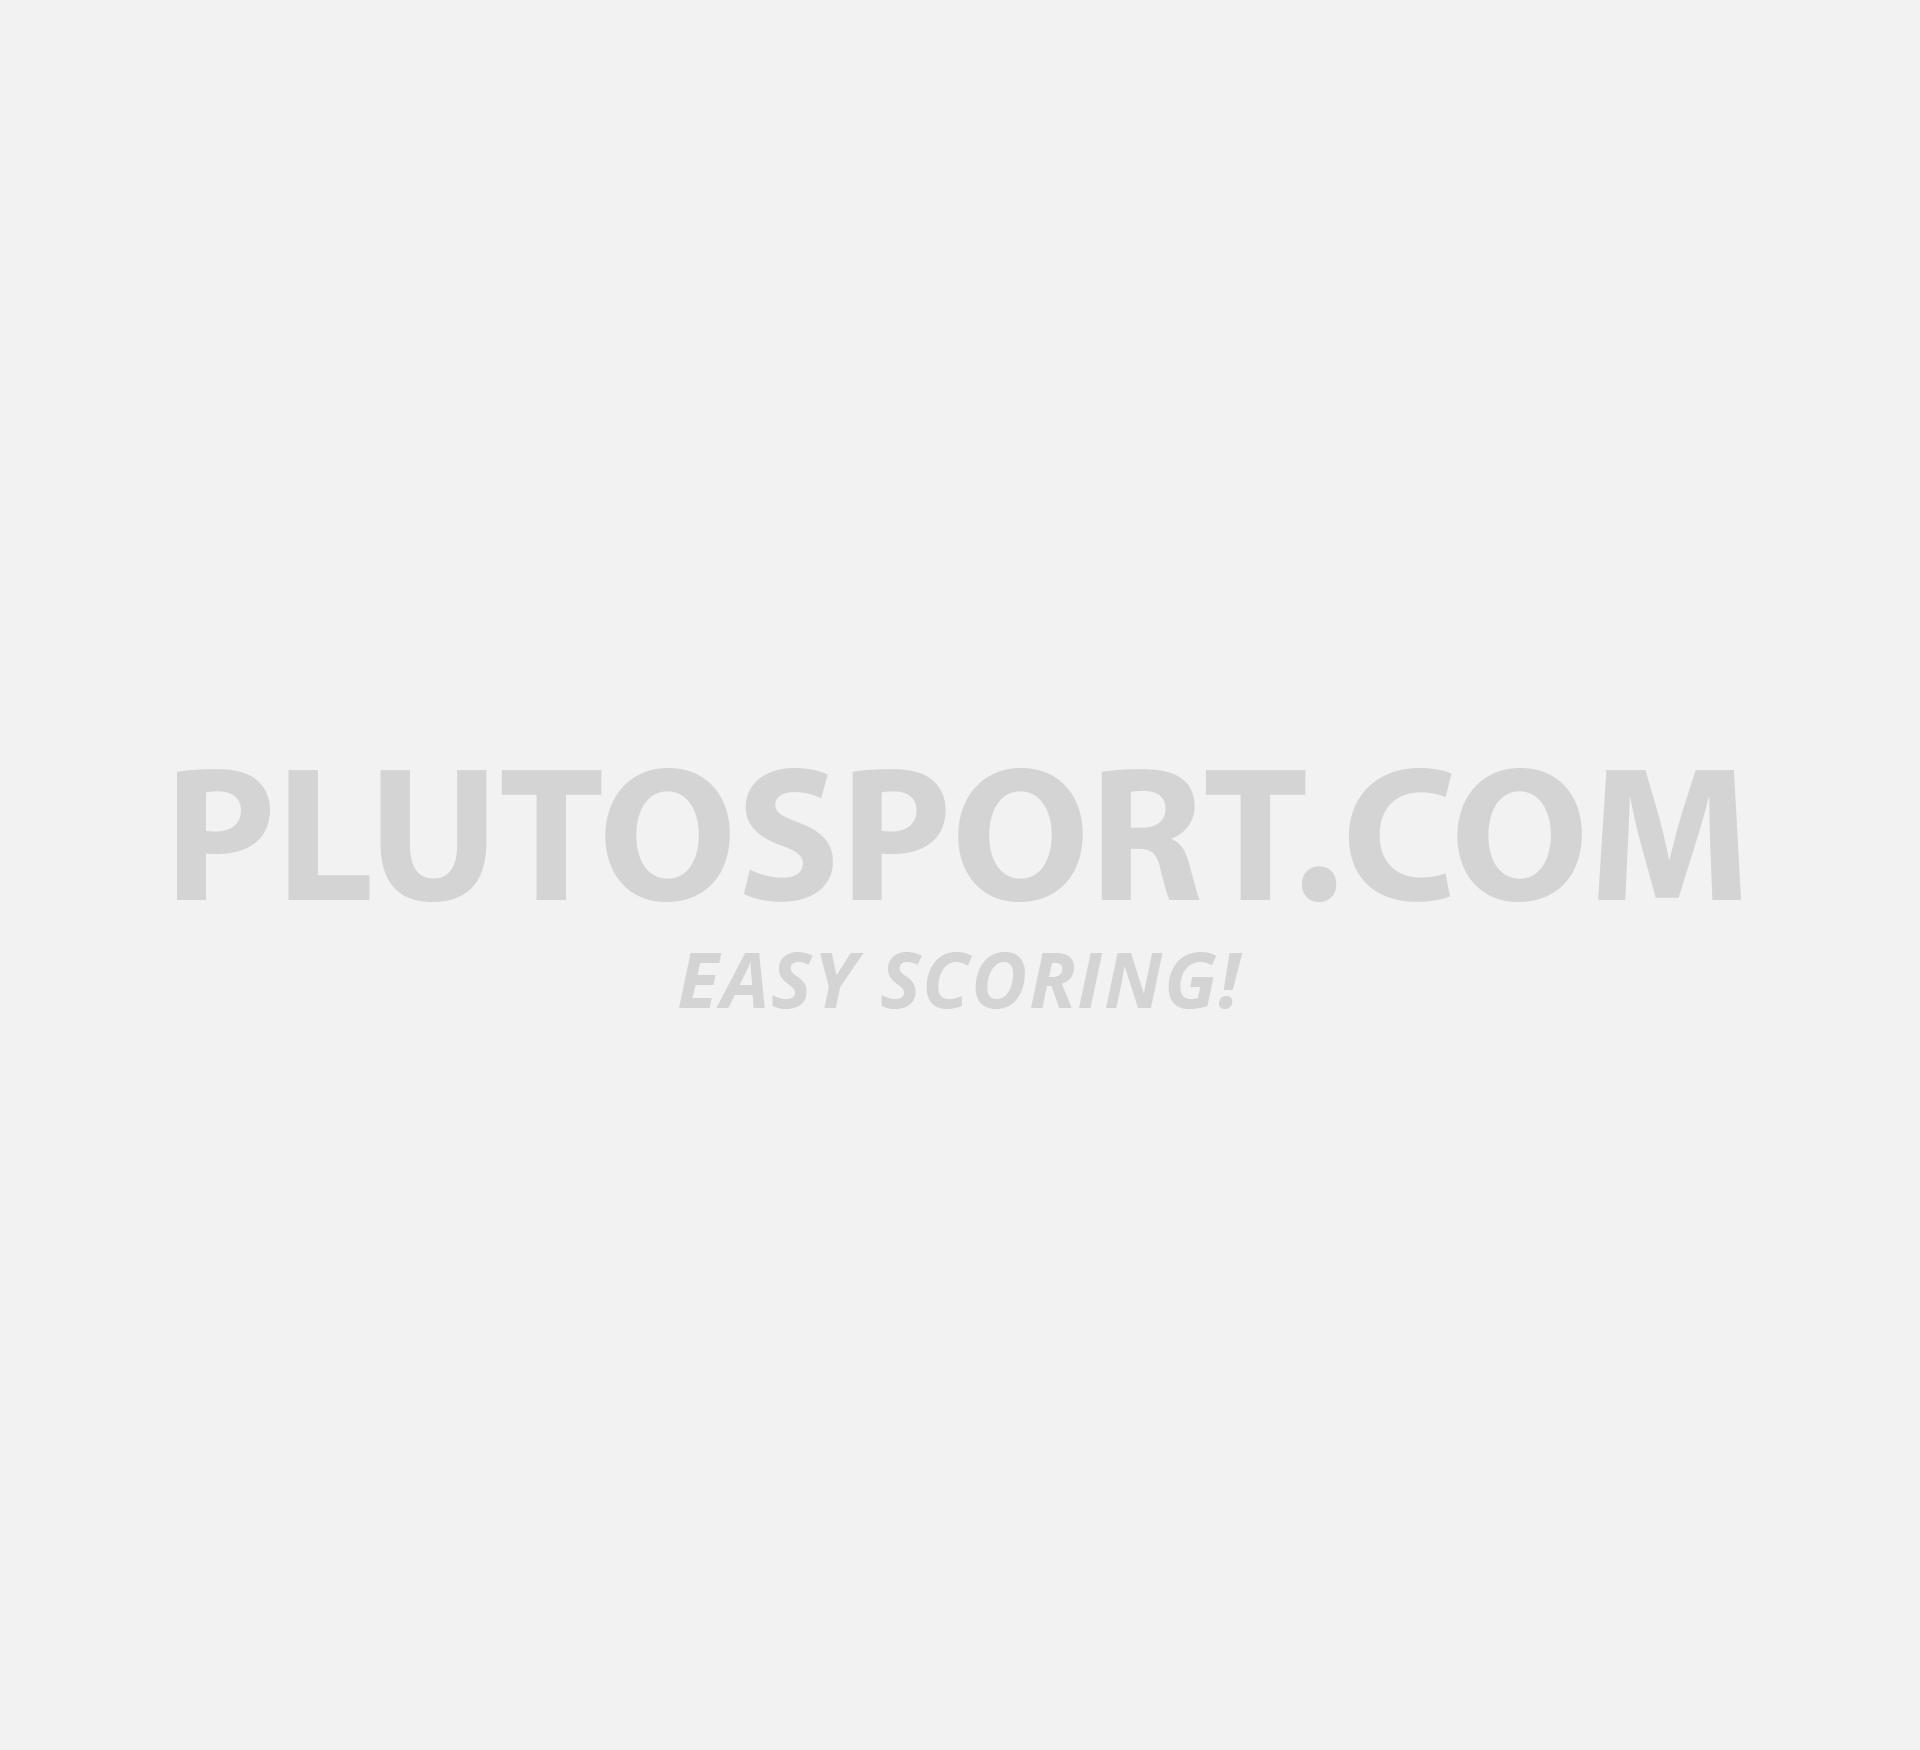 24312eefd Levi's Olympic Logo Flexfit - Caps - Accessories - Lifestyle - Sports |  Plutosport